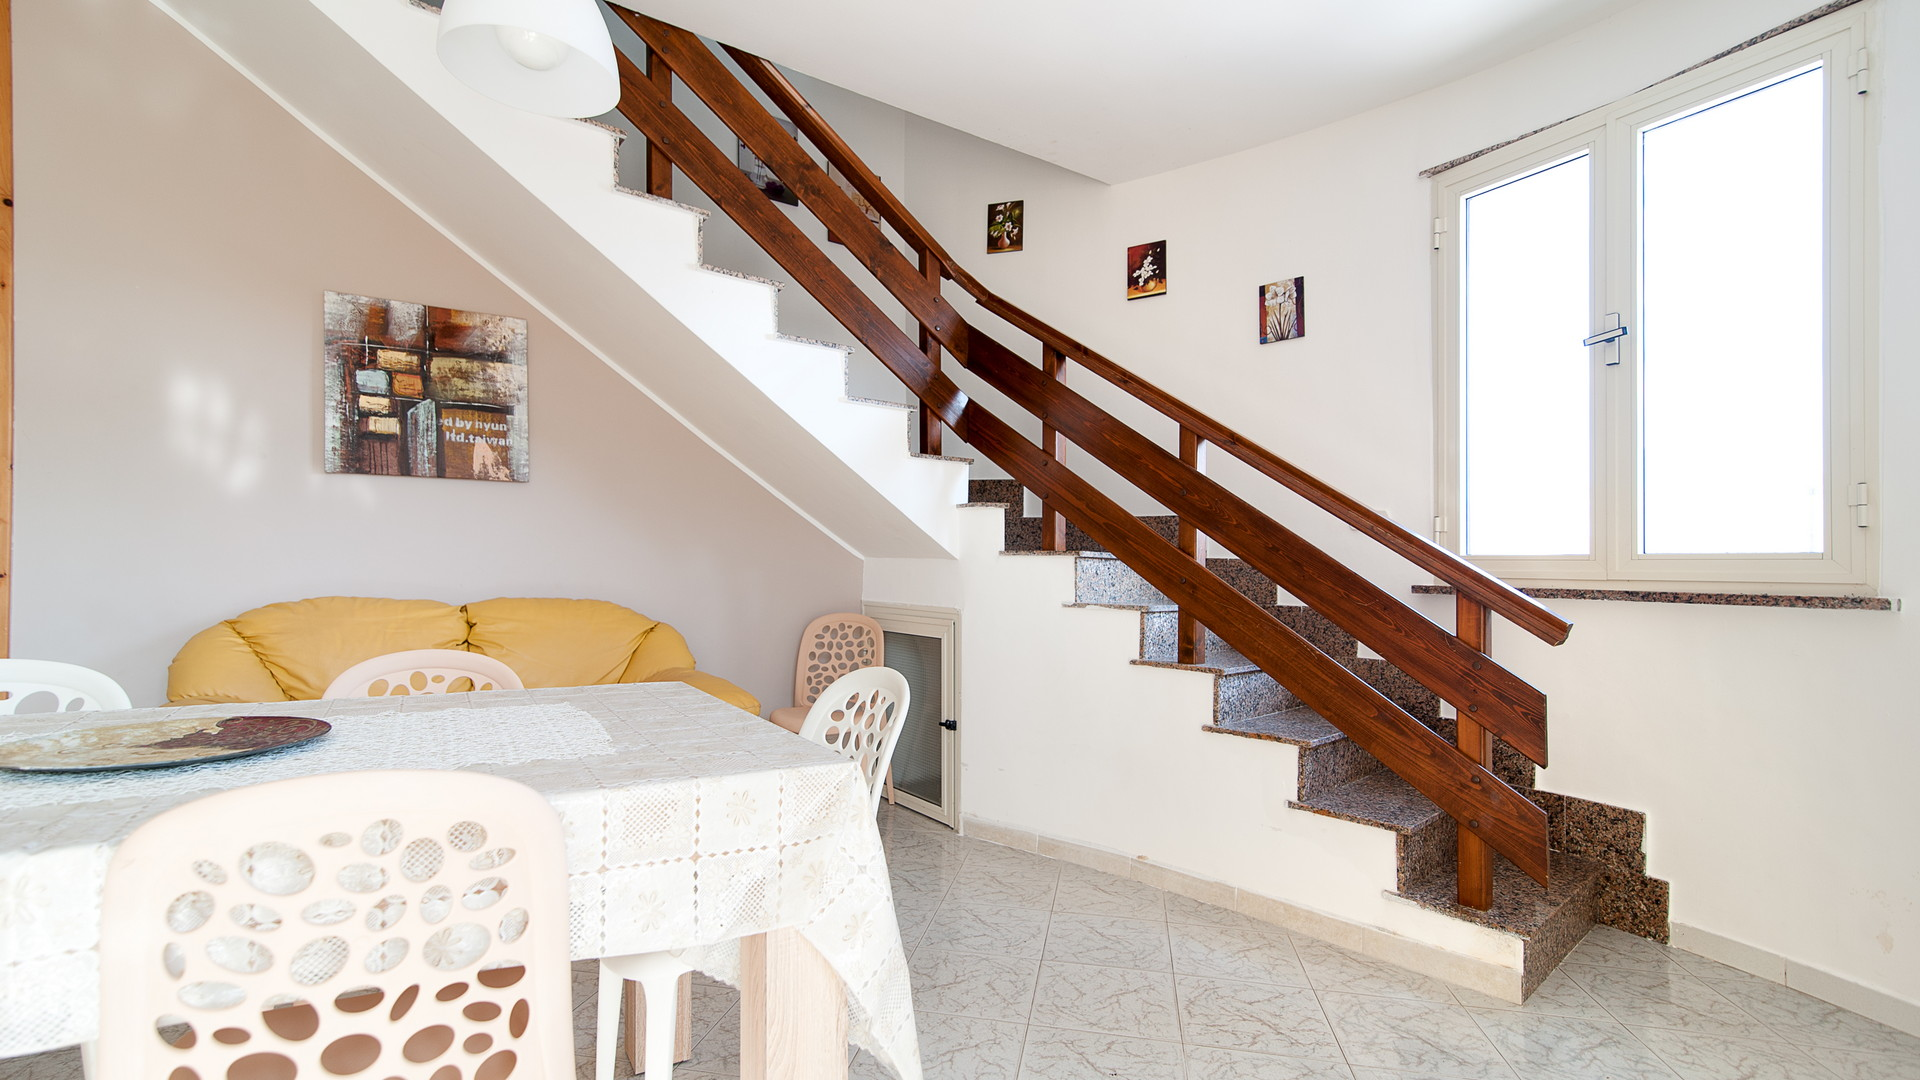 Ferienhaus Villa Due Mari-20 meters from the beach (2354062), Porto Cesareo, Lecce, Apulien, Italien, Bild 4